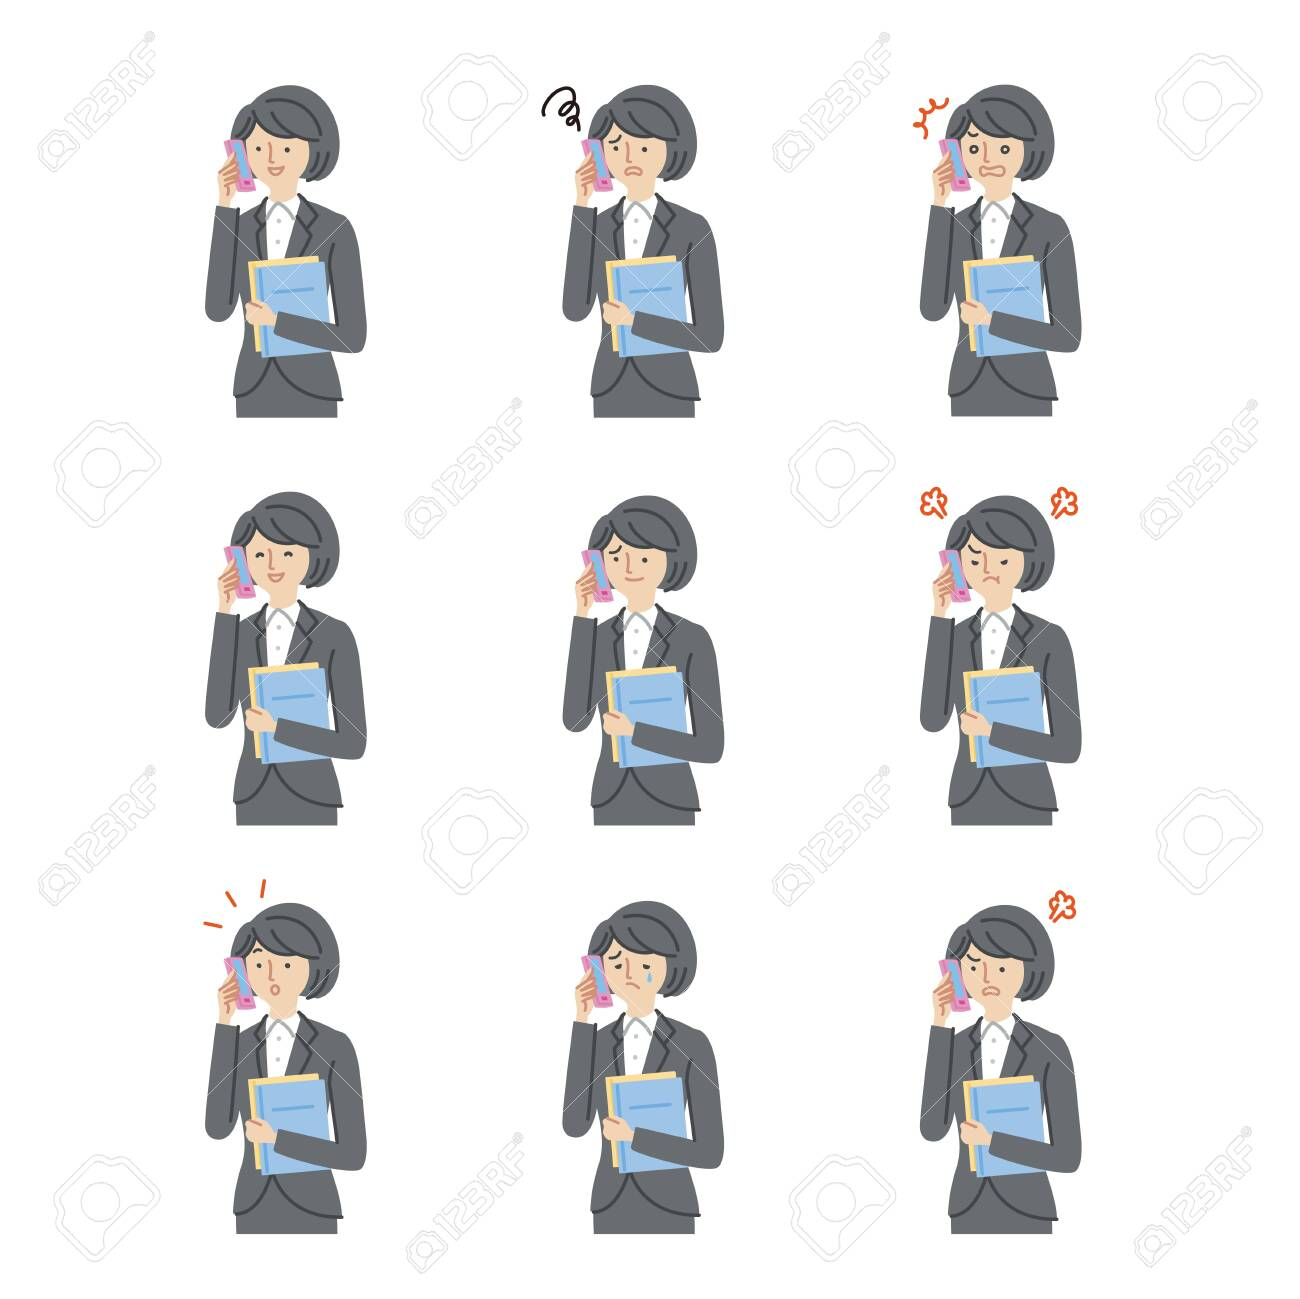 Business: Women, smartphones, facial expressions, variation set(stroke) - 153067830